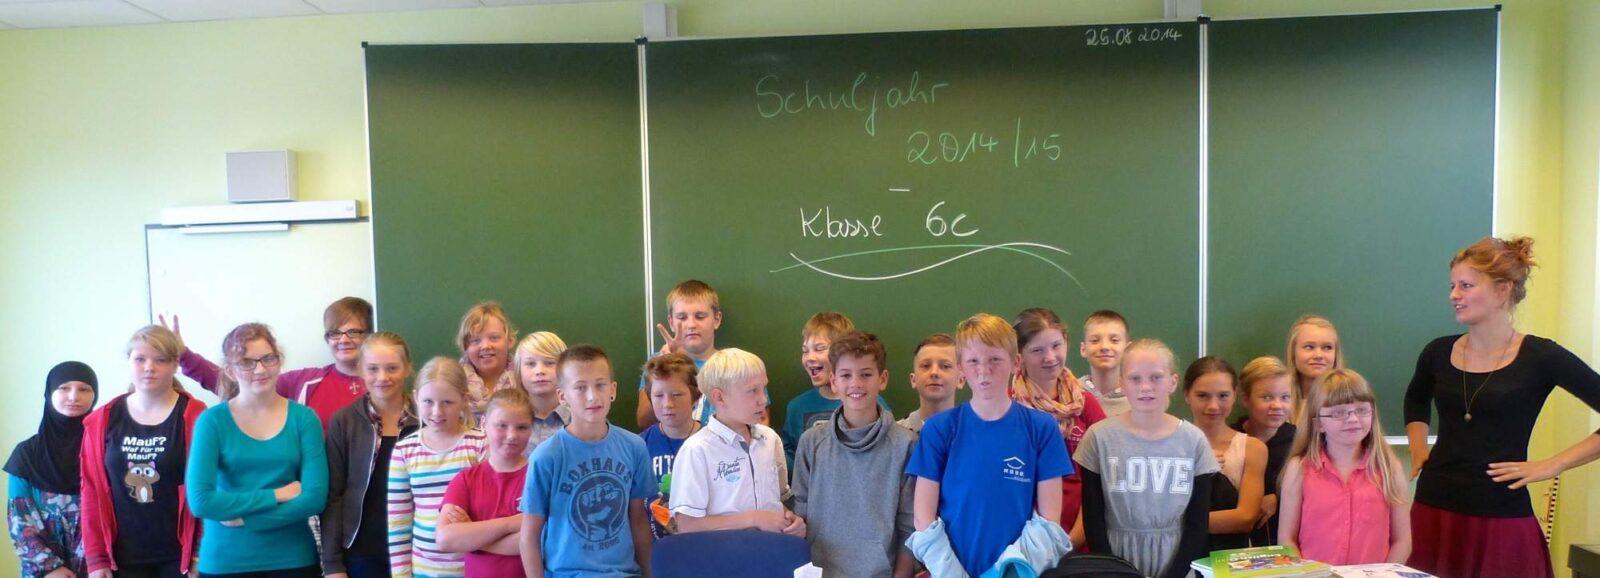 klasse-6c-2014ulk